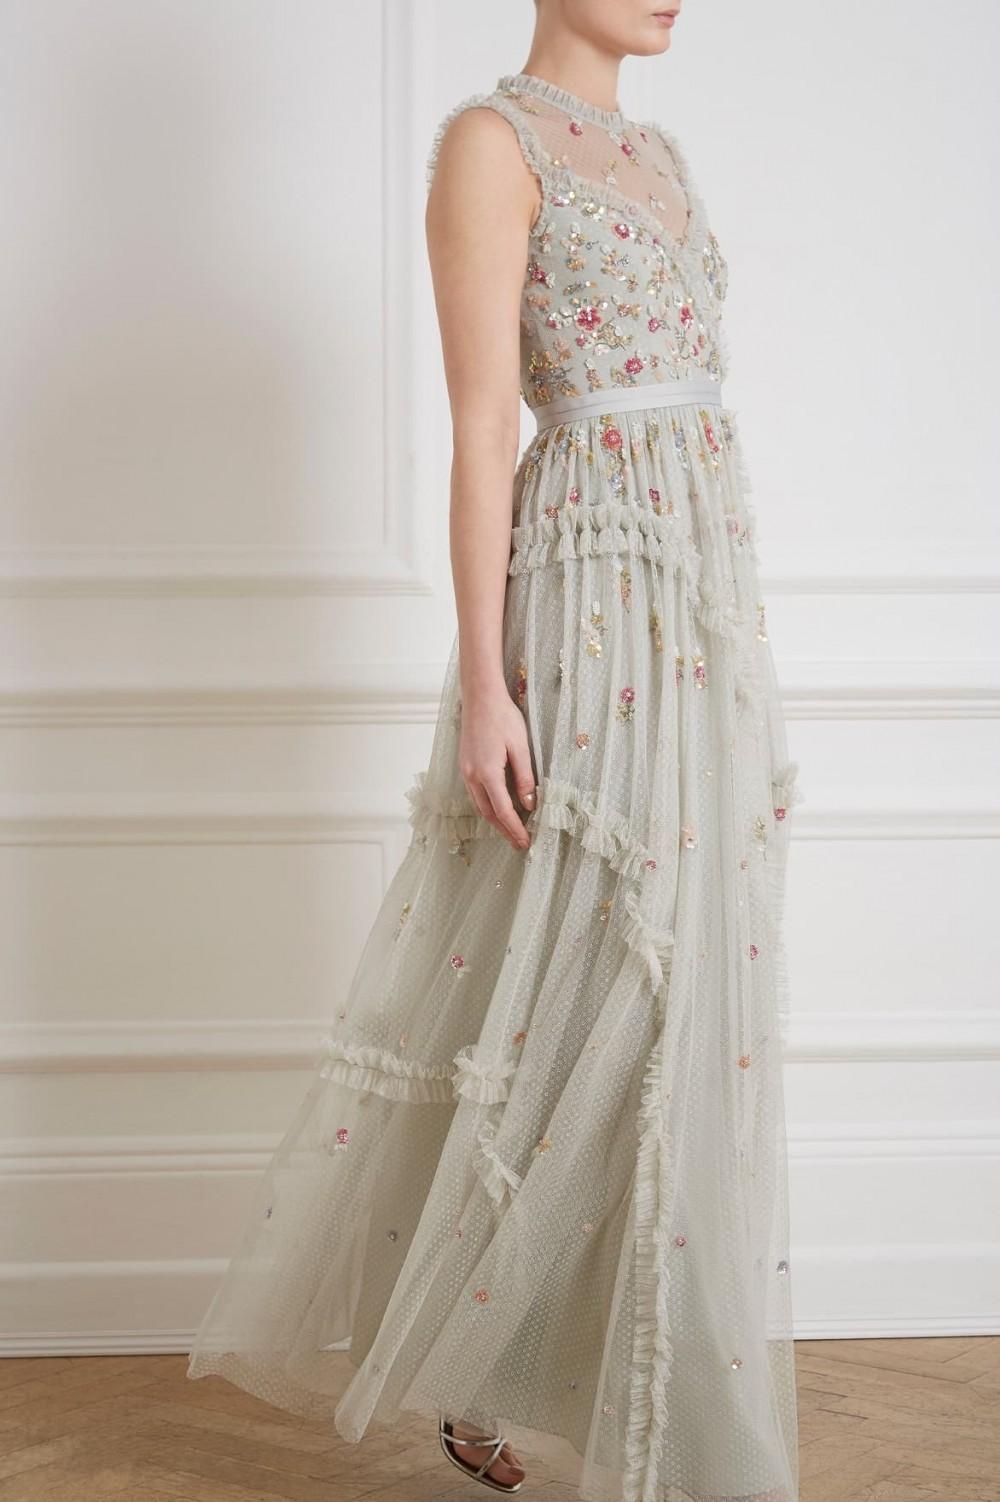 Shimmer dress style